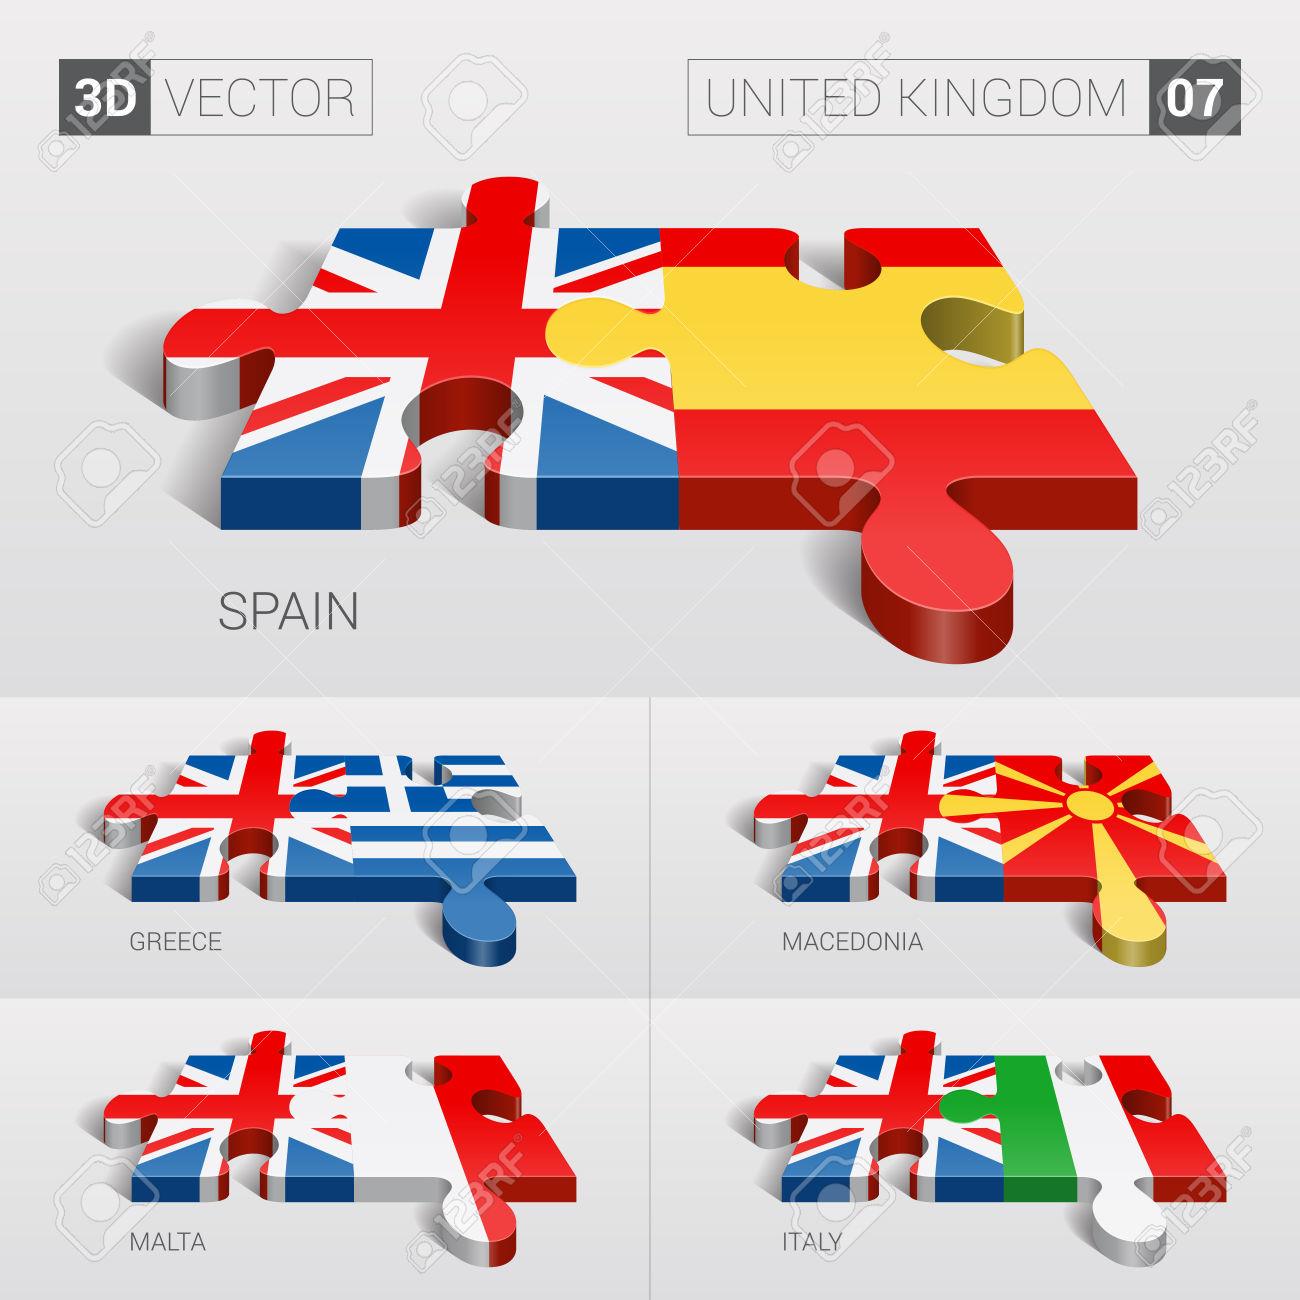 United Kingdom And Spain, Greece, Macedonia, Malta, Italy Flag.